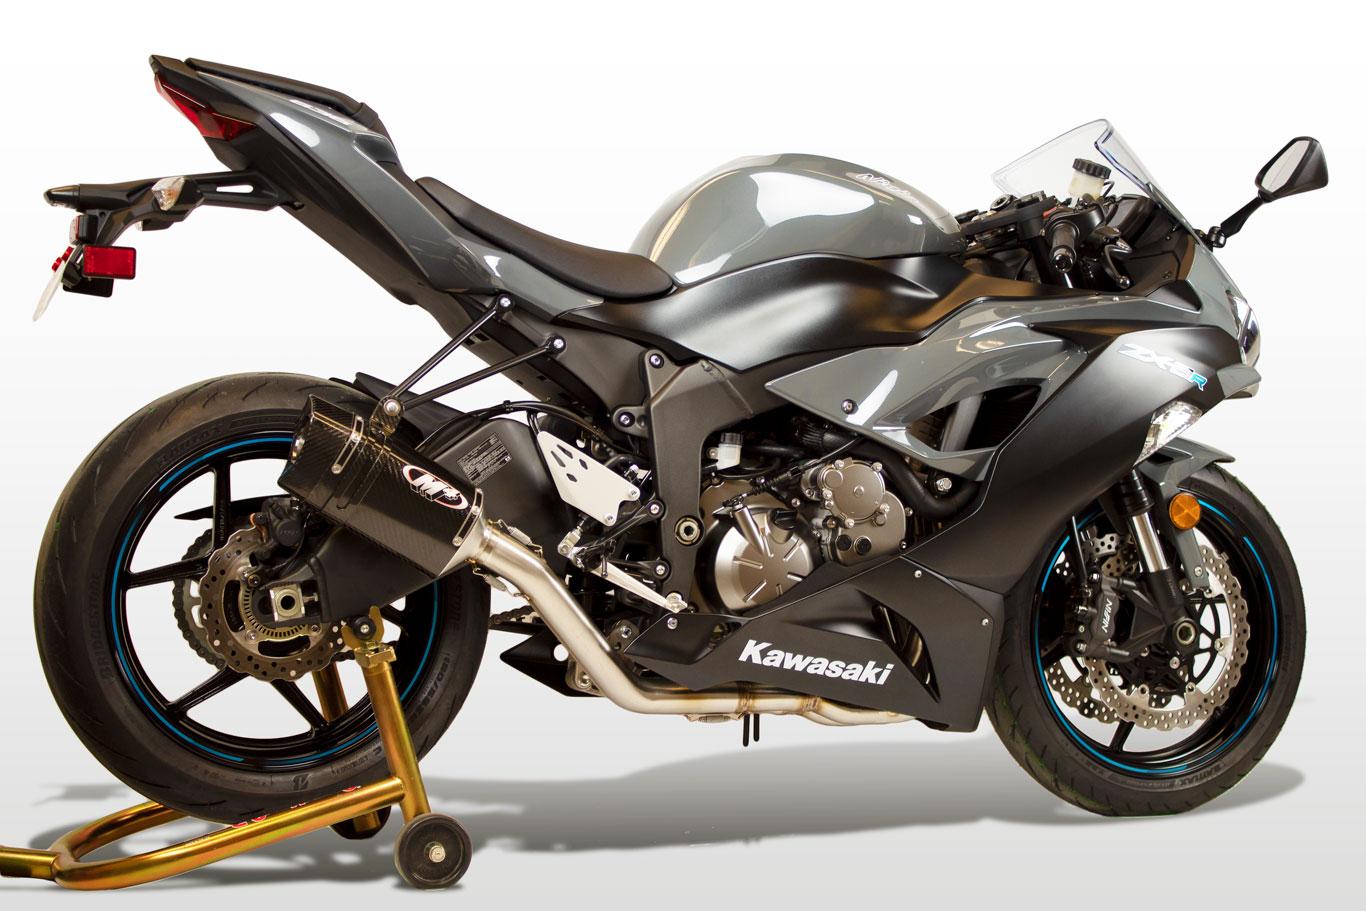 2009 2021 kawasaki zx 6r full system mc36 carbon shop m4 exhaust